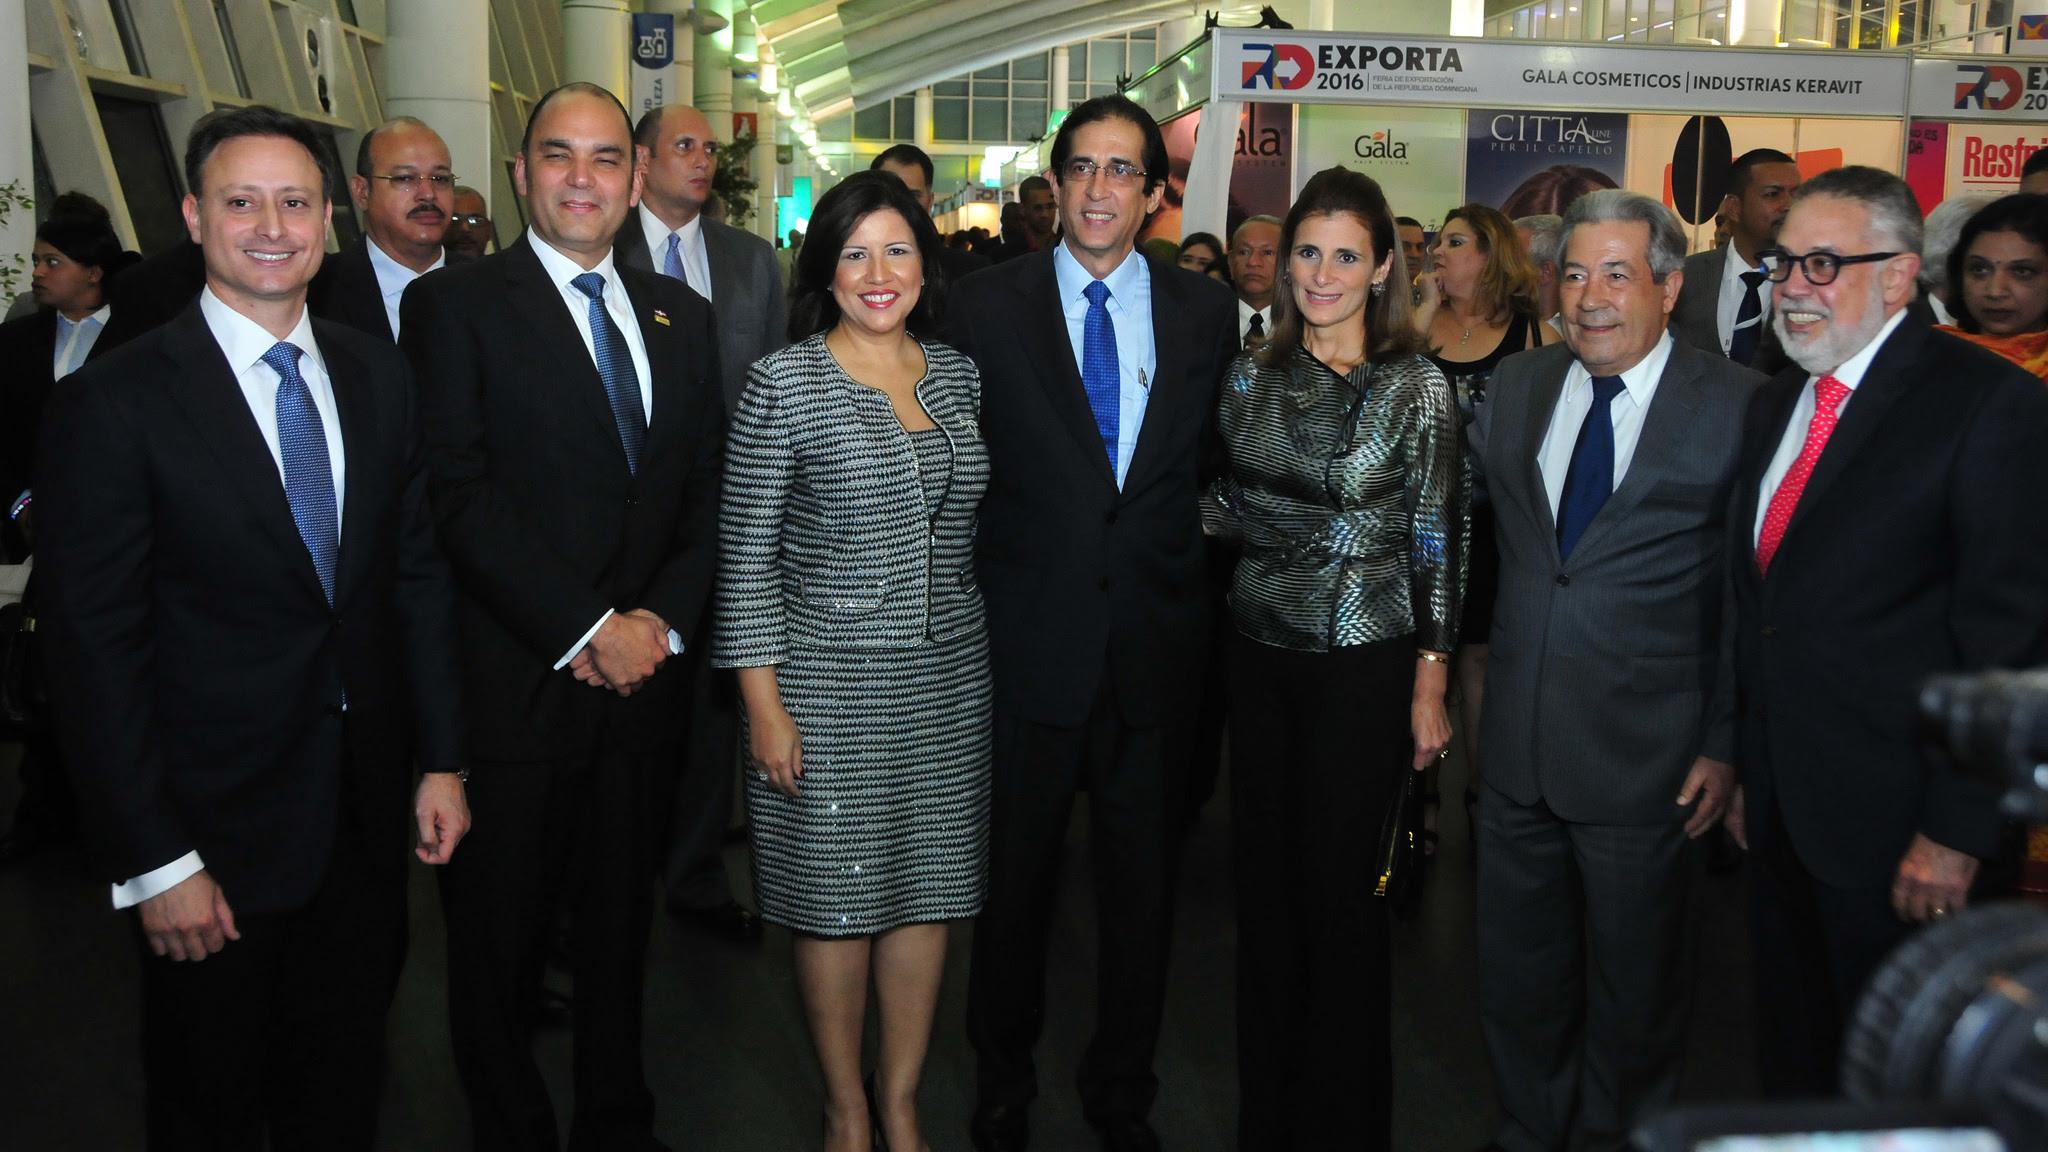 inauguracion rd exporta 2016